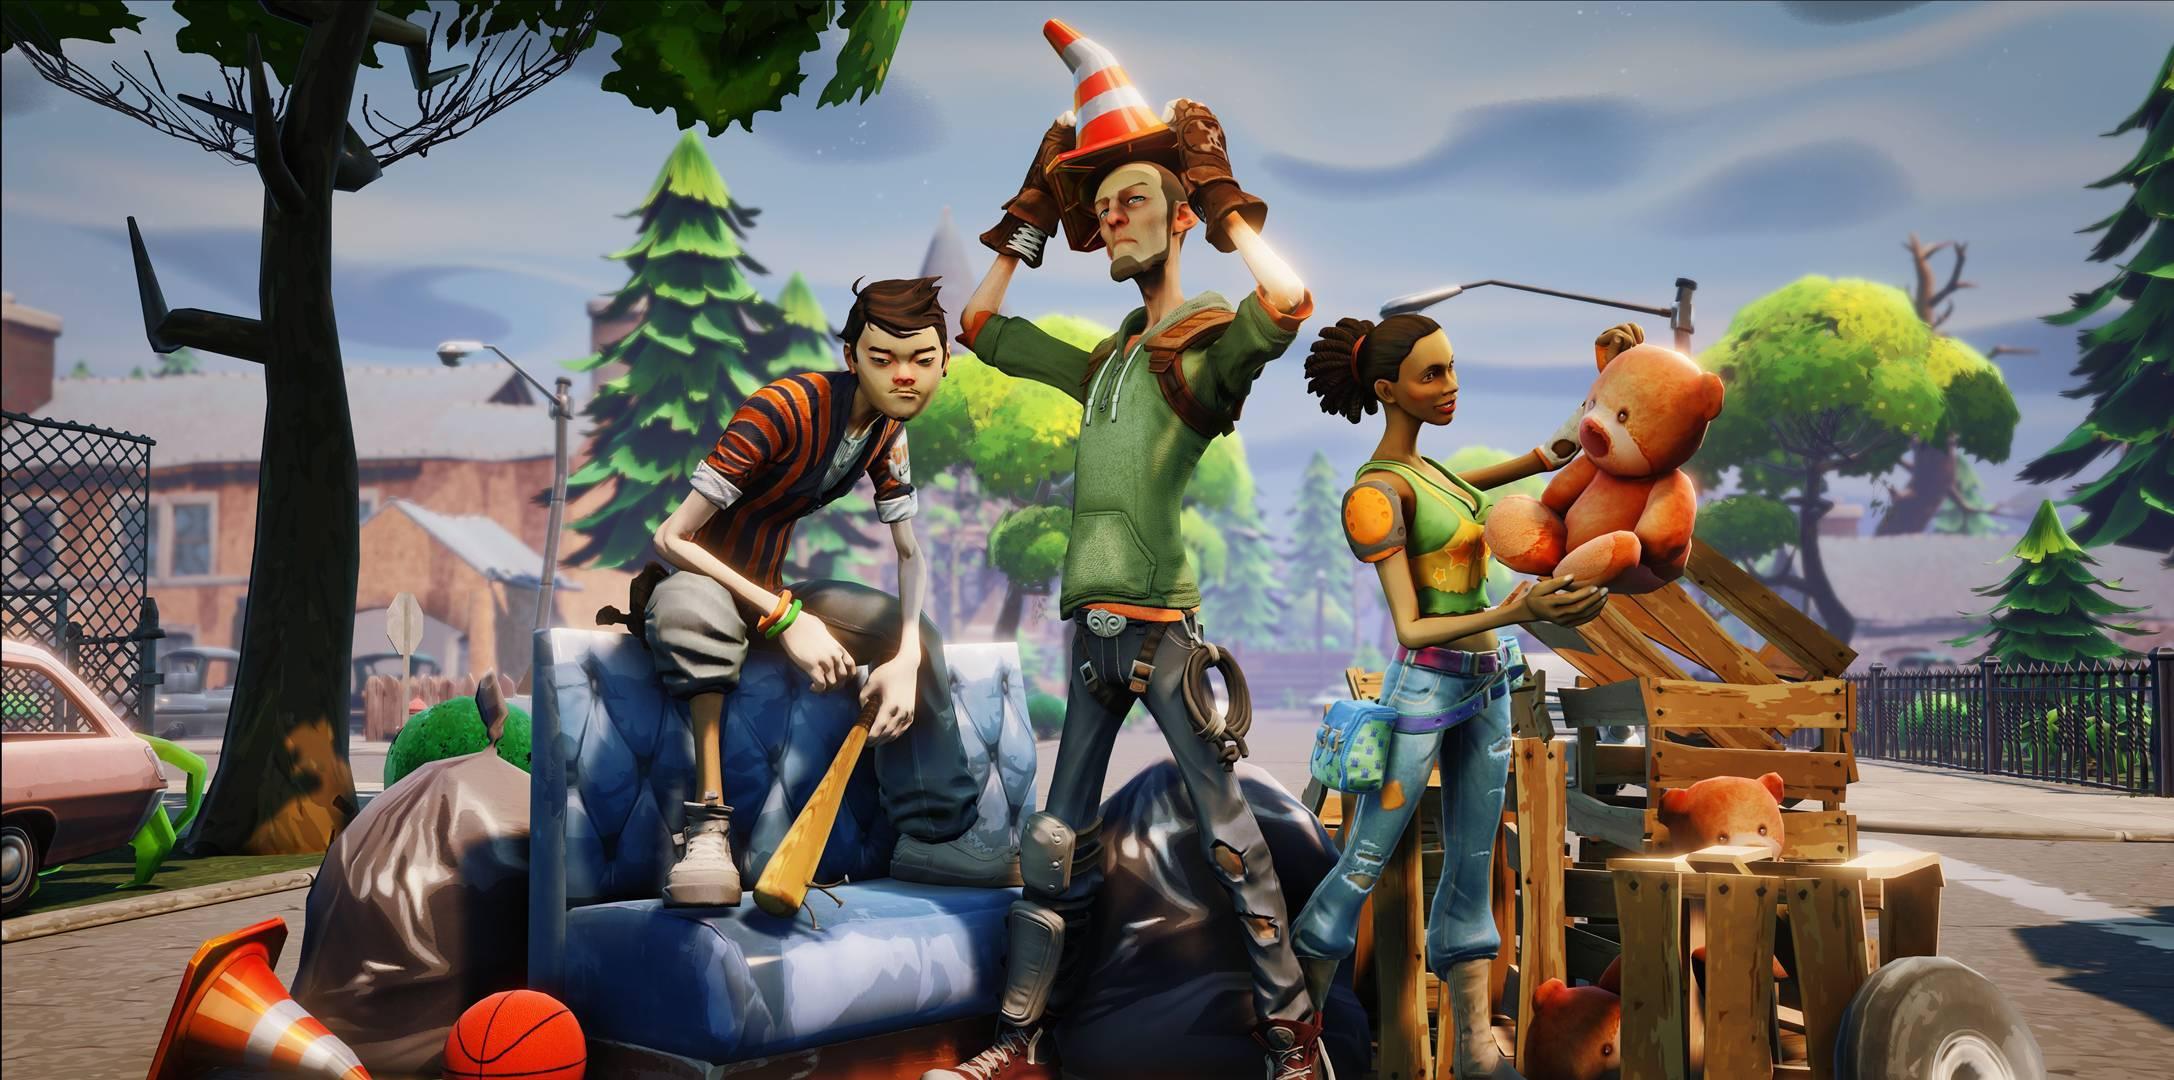 epic games fortnite hd wallpaper GamingBoltcom Video Game News 2174x1080